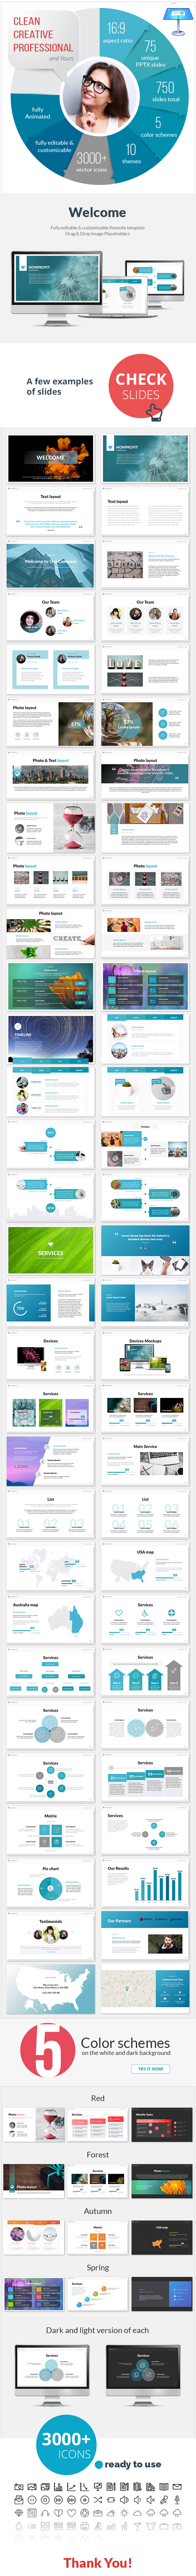 Multipurpose Nonprofit Keynote Presentation Template - Keynote Templates Presentation Templates